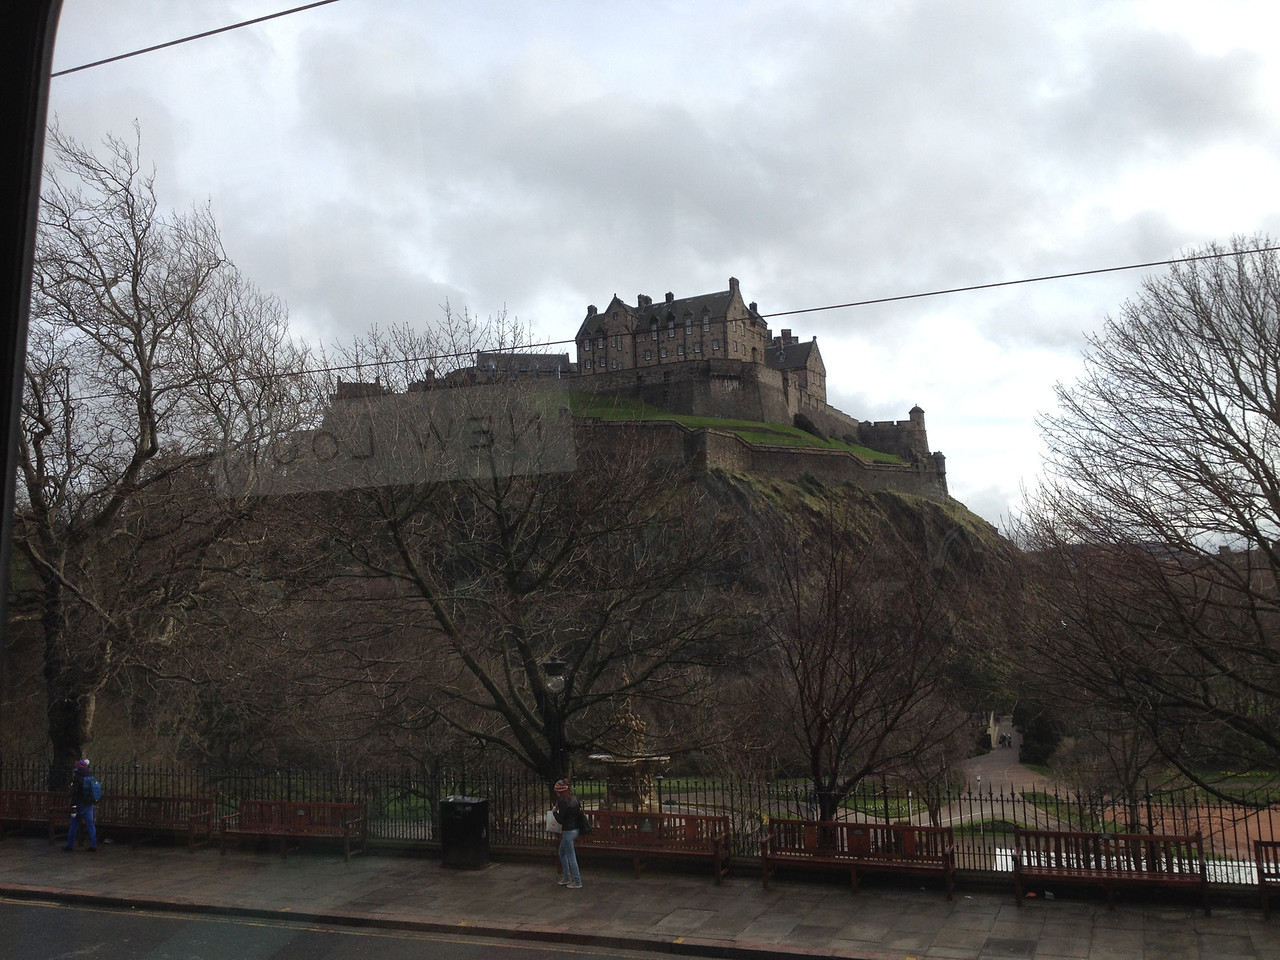 Edinburgh Castle as seen from the bus.